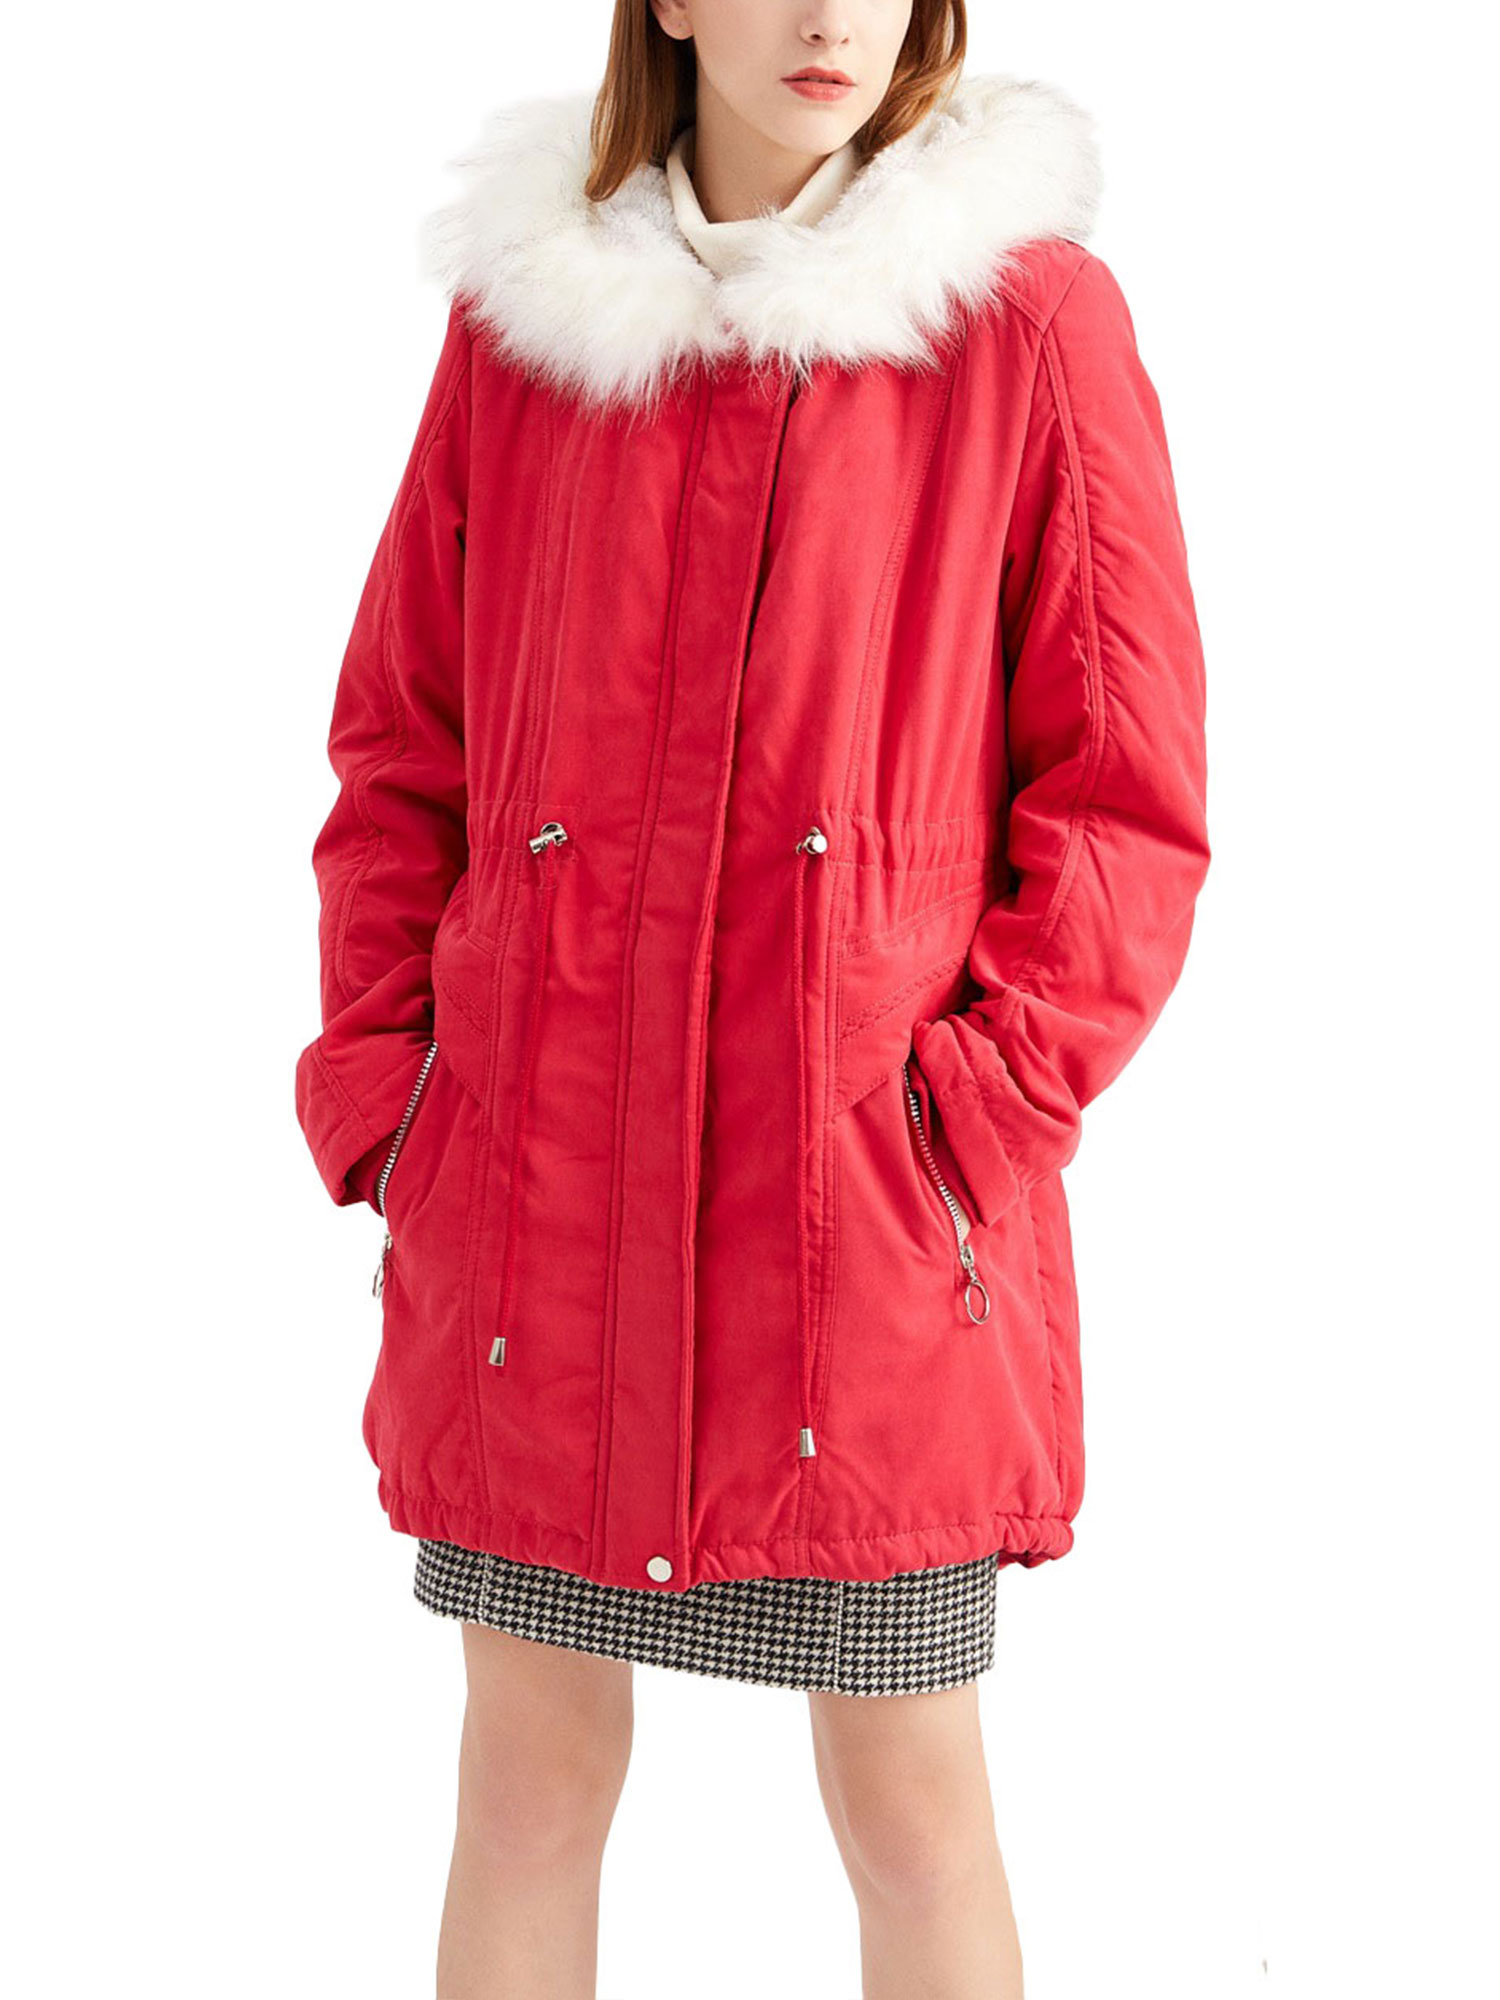 Children Jacket Coat Hooded Boys Camouflage Velvet Lining Warm Thicken Outwear